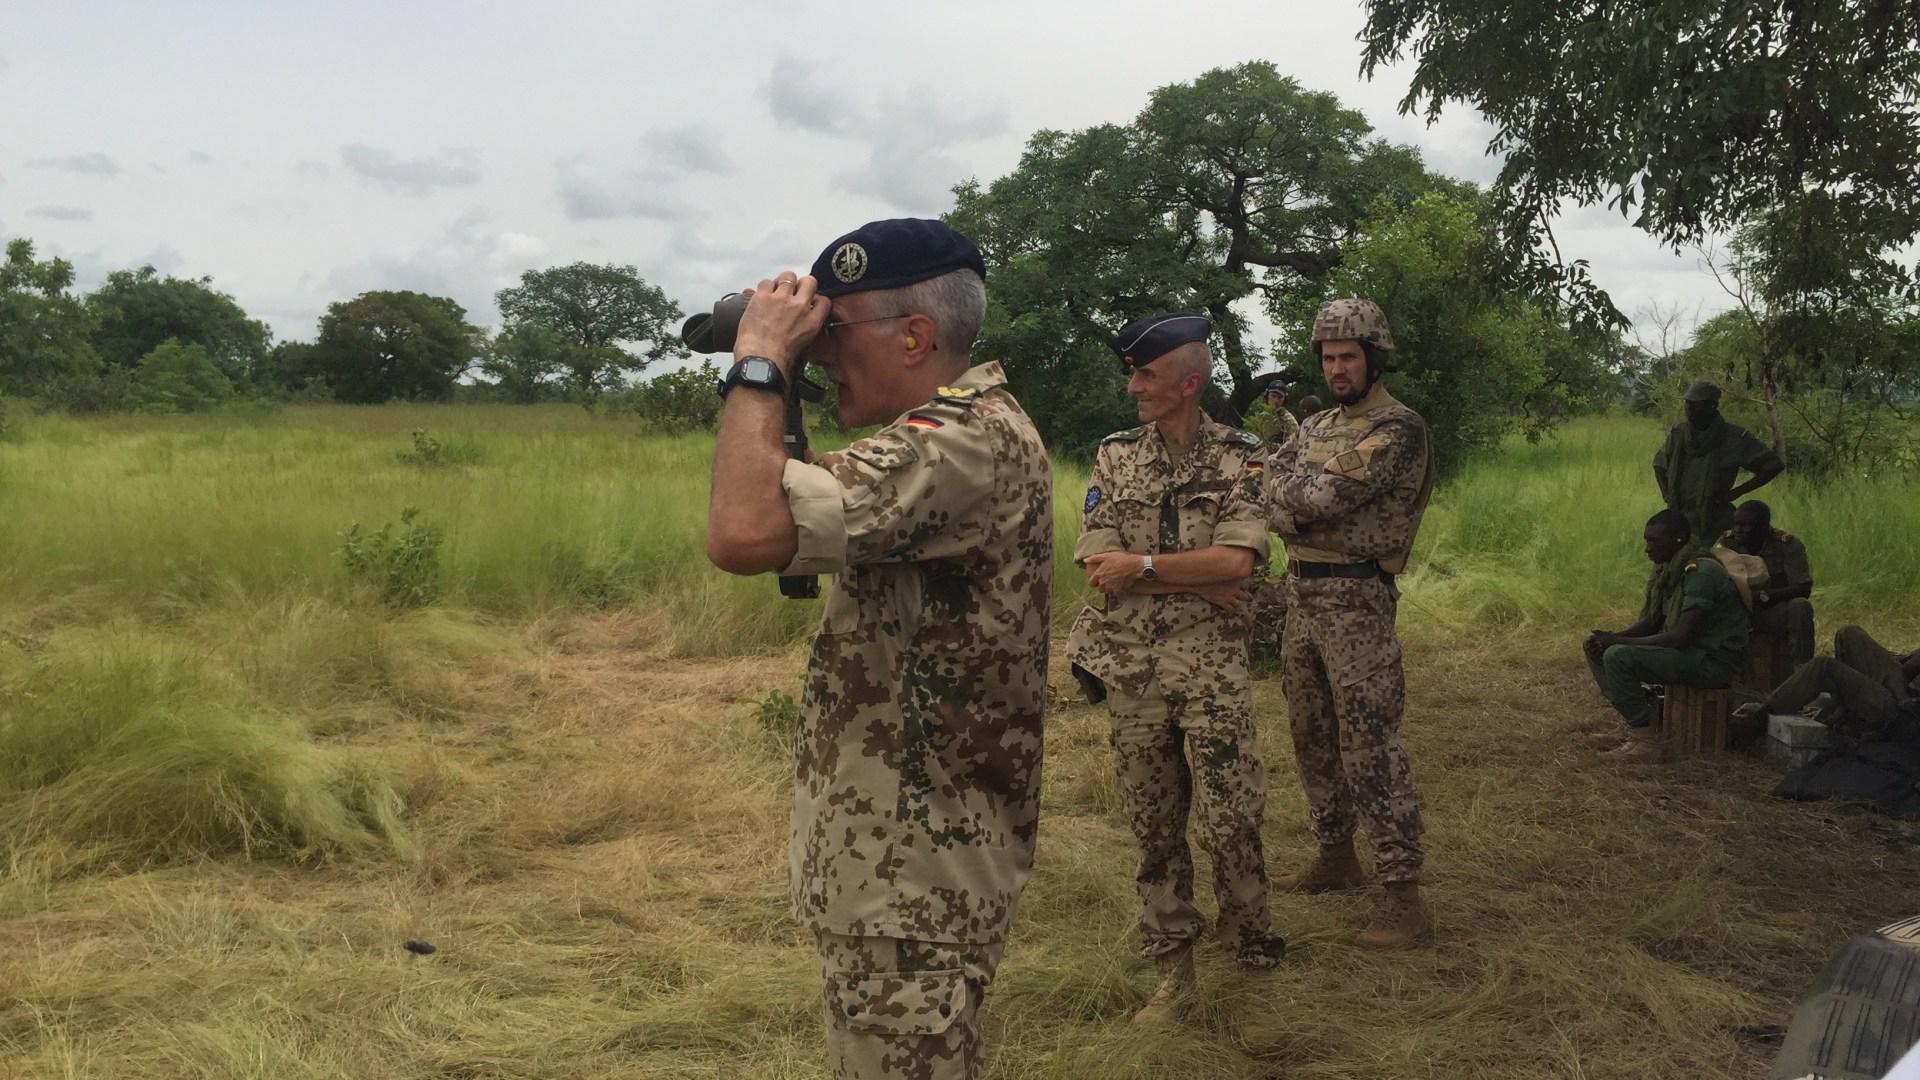 Gen. Pfrengle at the shooting range